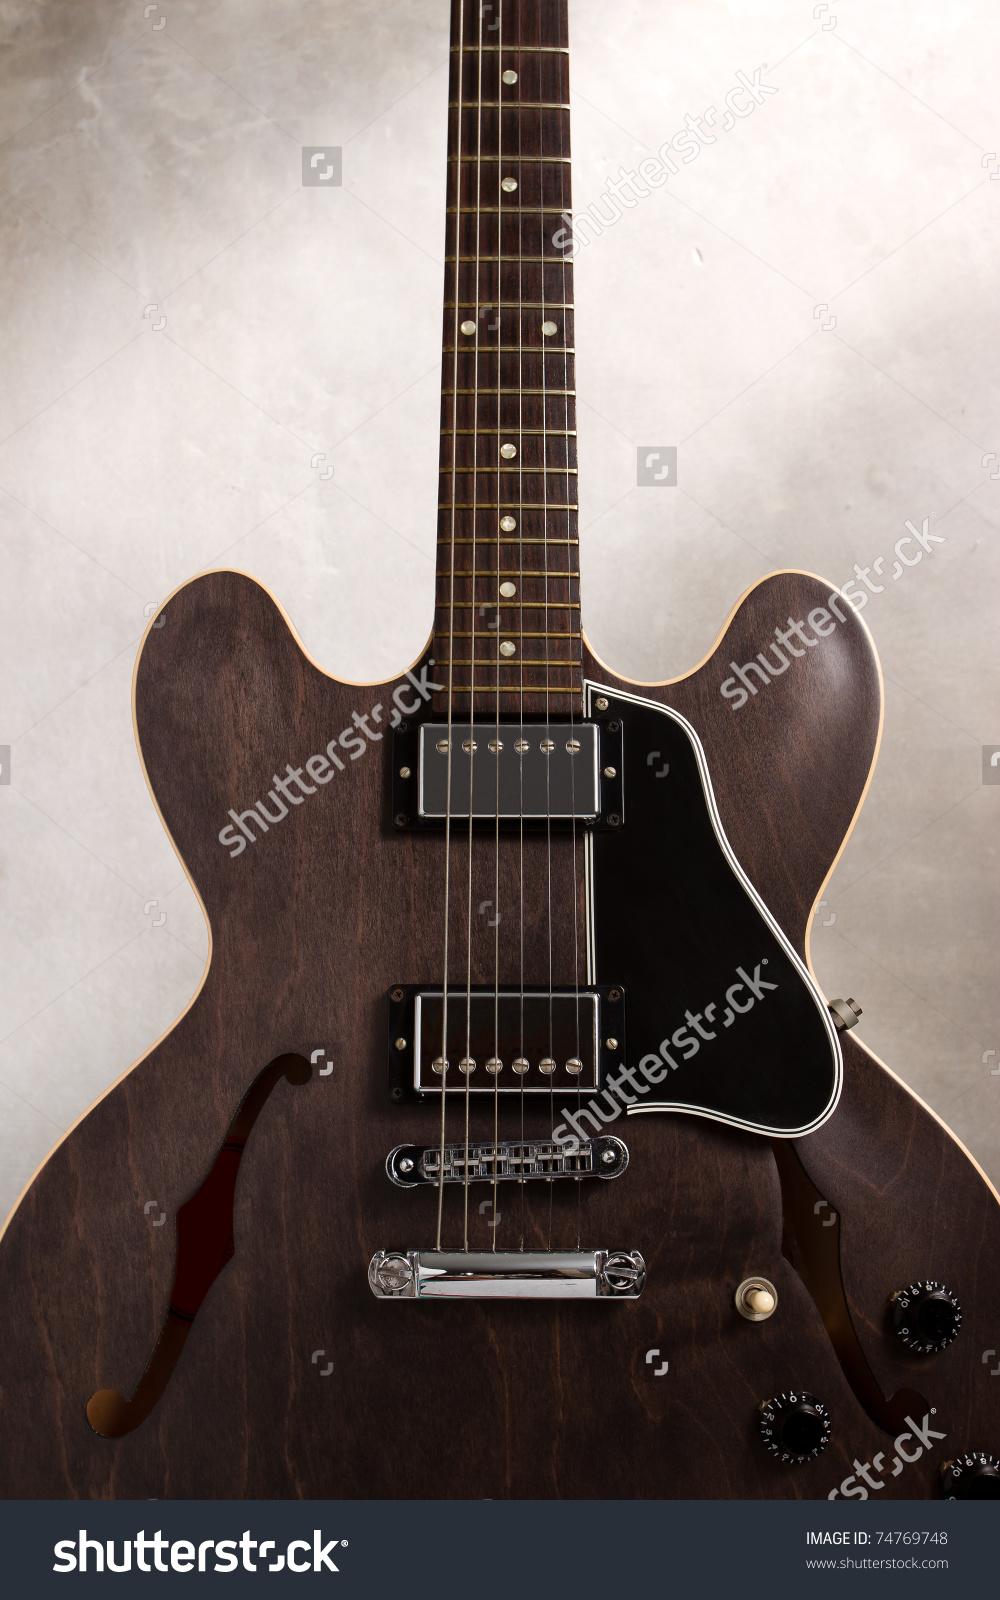 Close Semi Hollow Body Guitar Stock Photo 74769748.